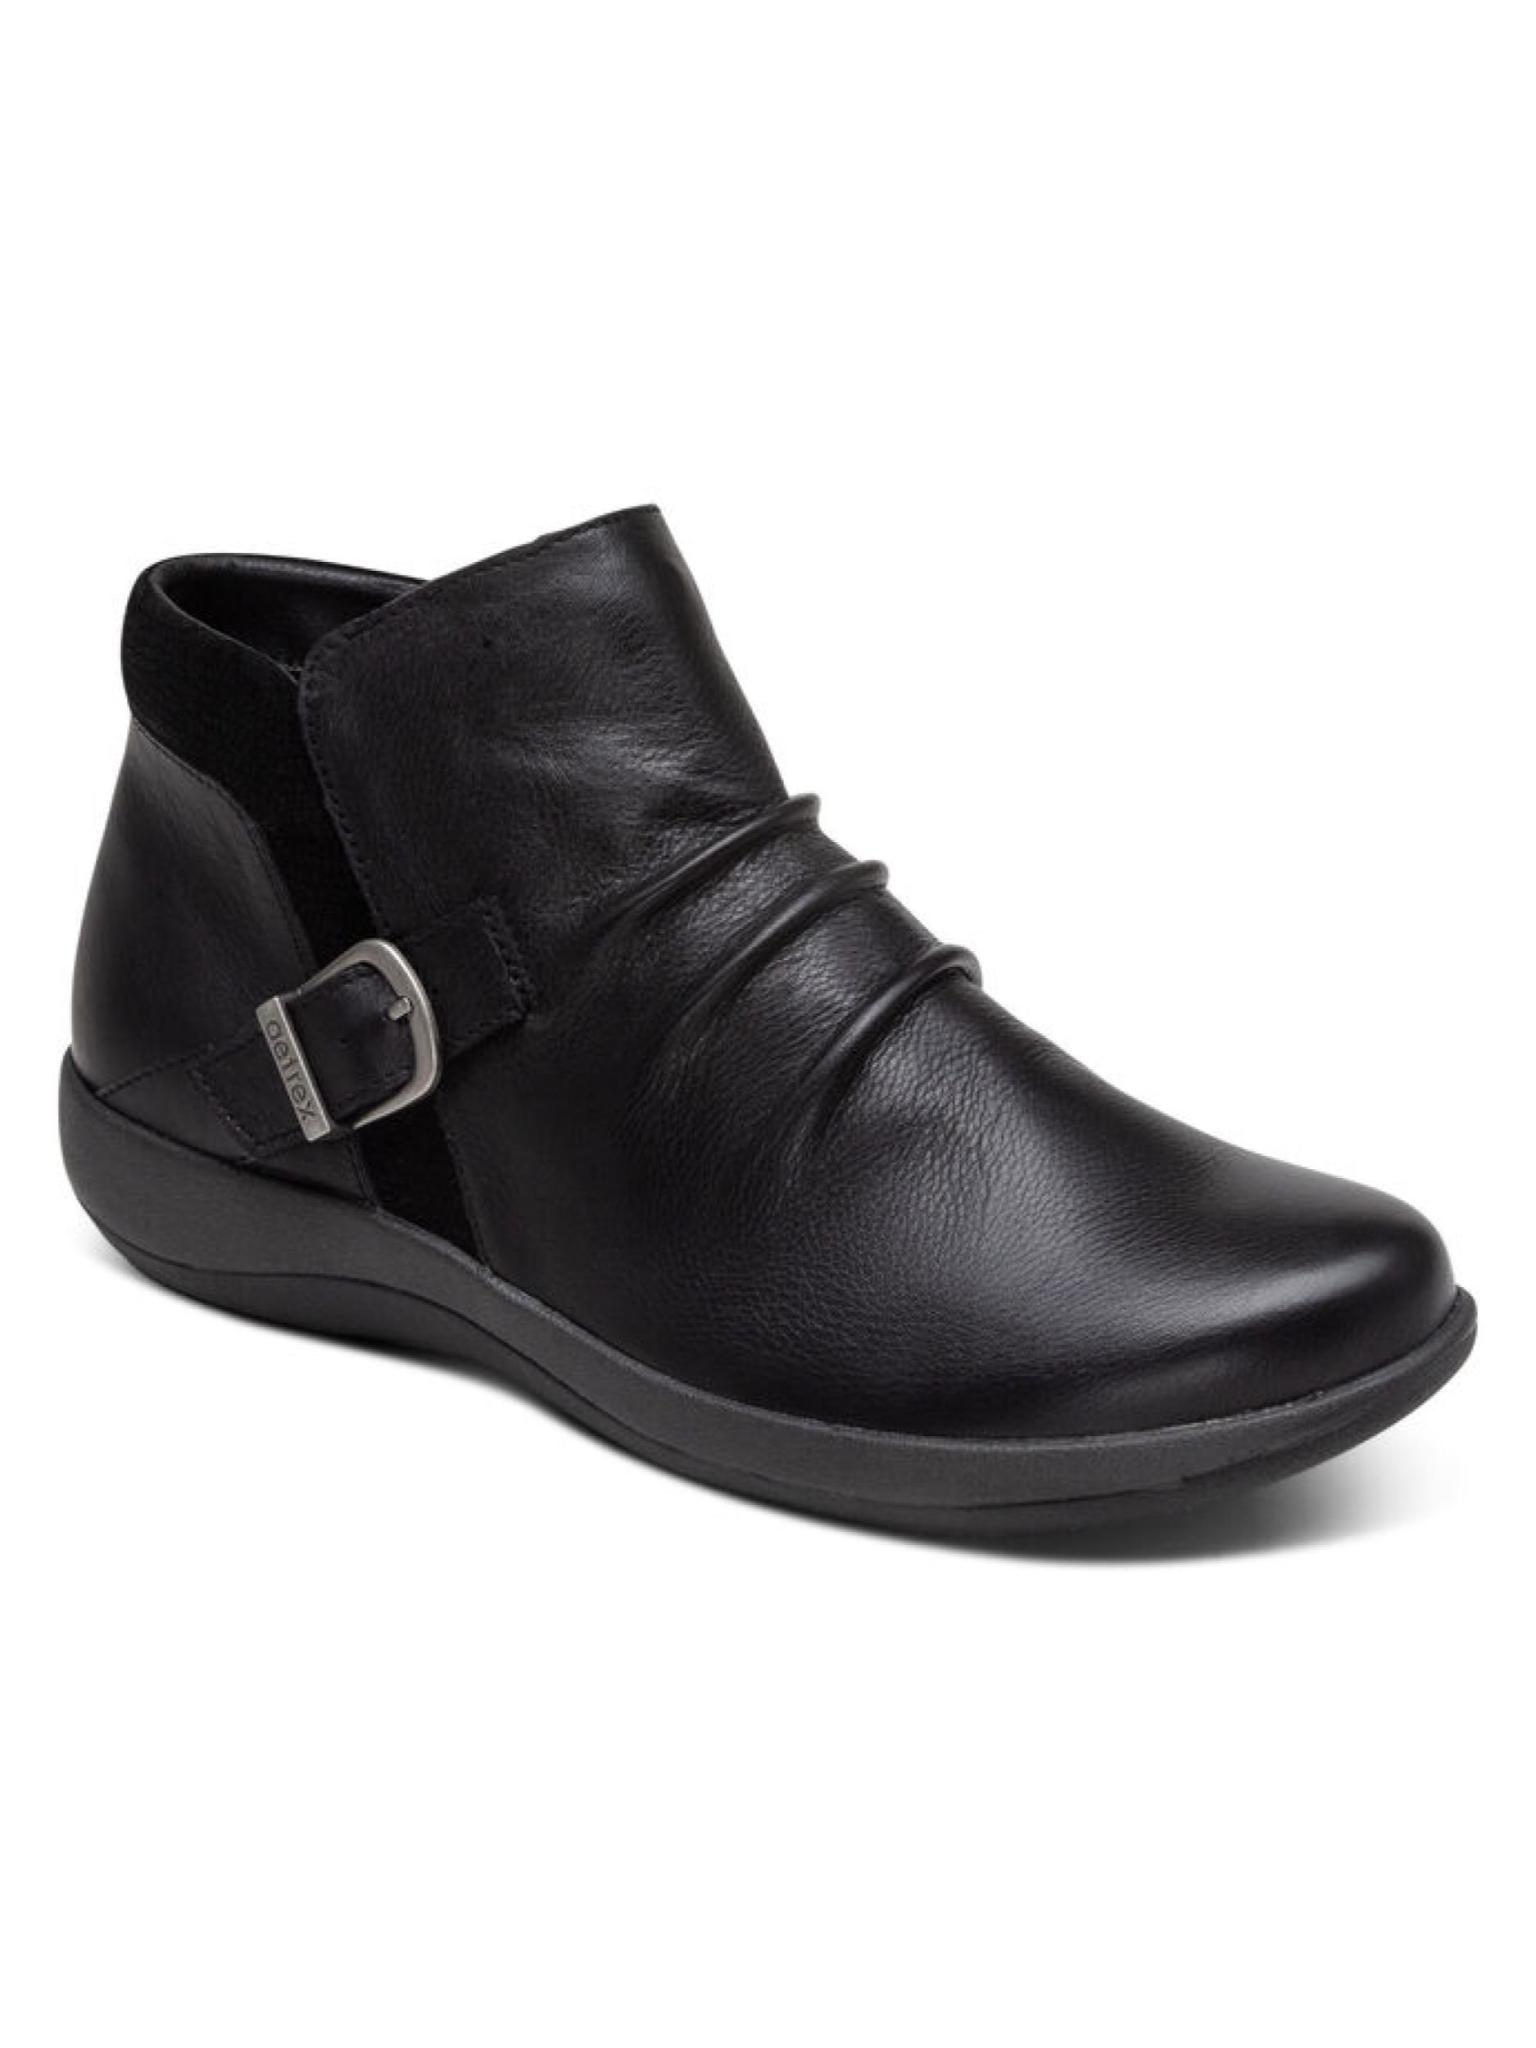 Aetrex Women's Luna Ankle Boot